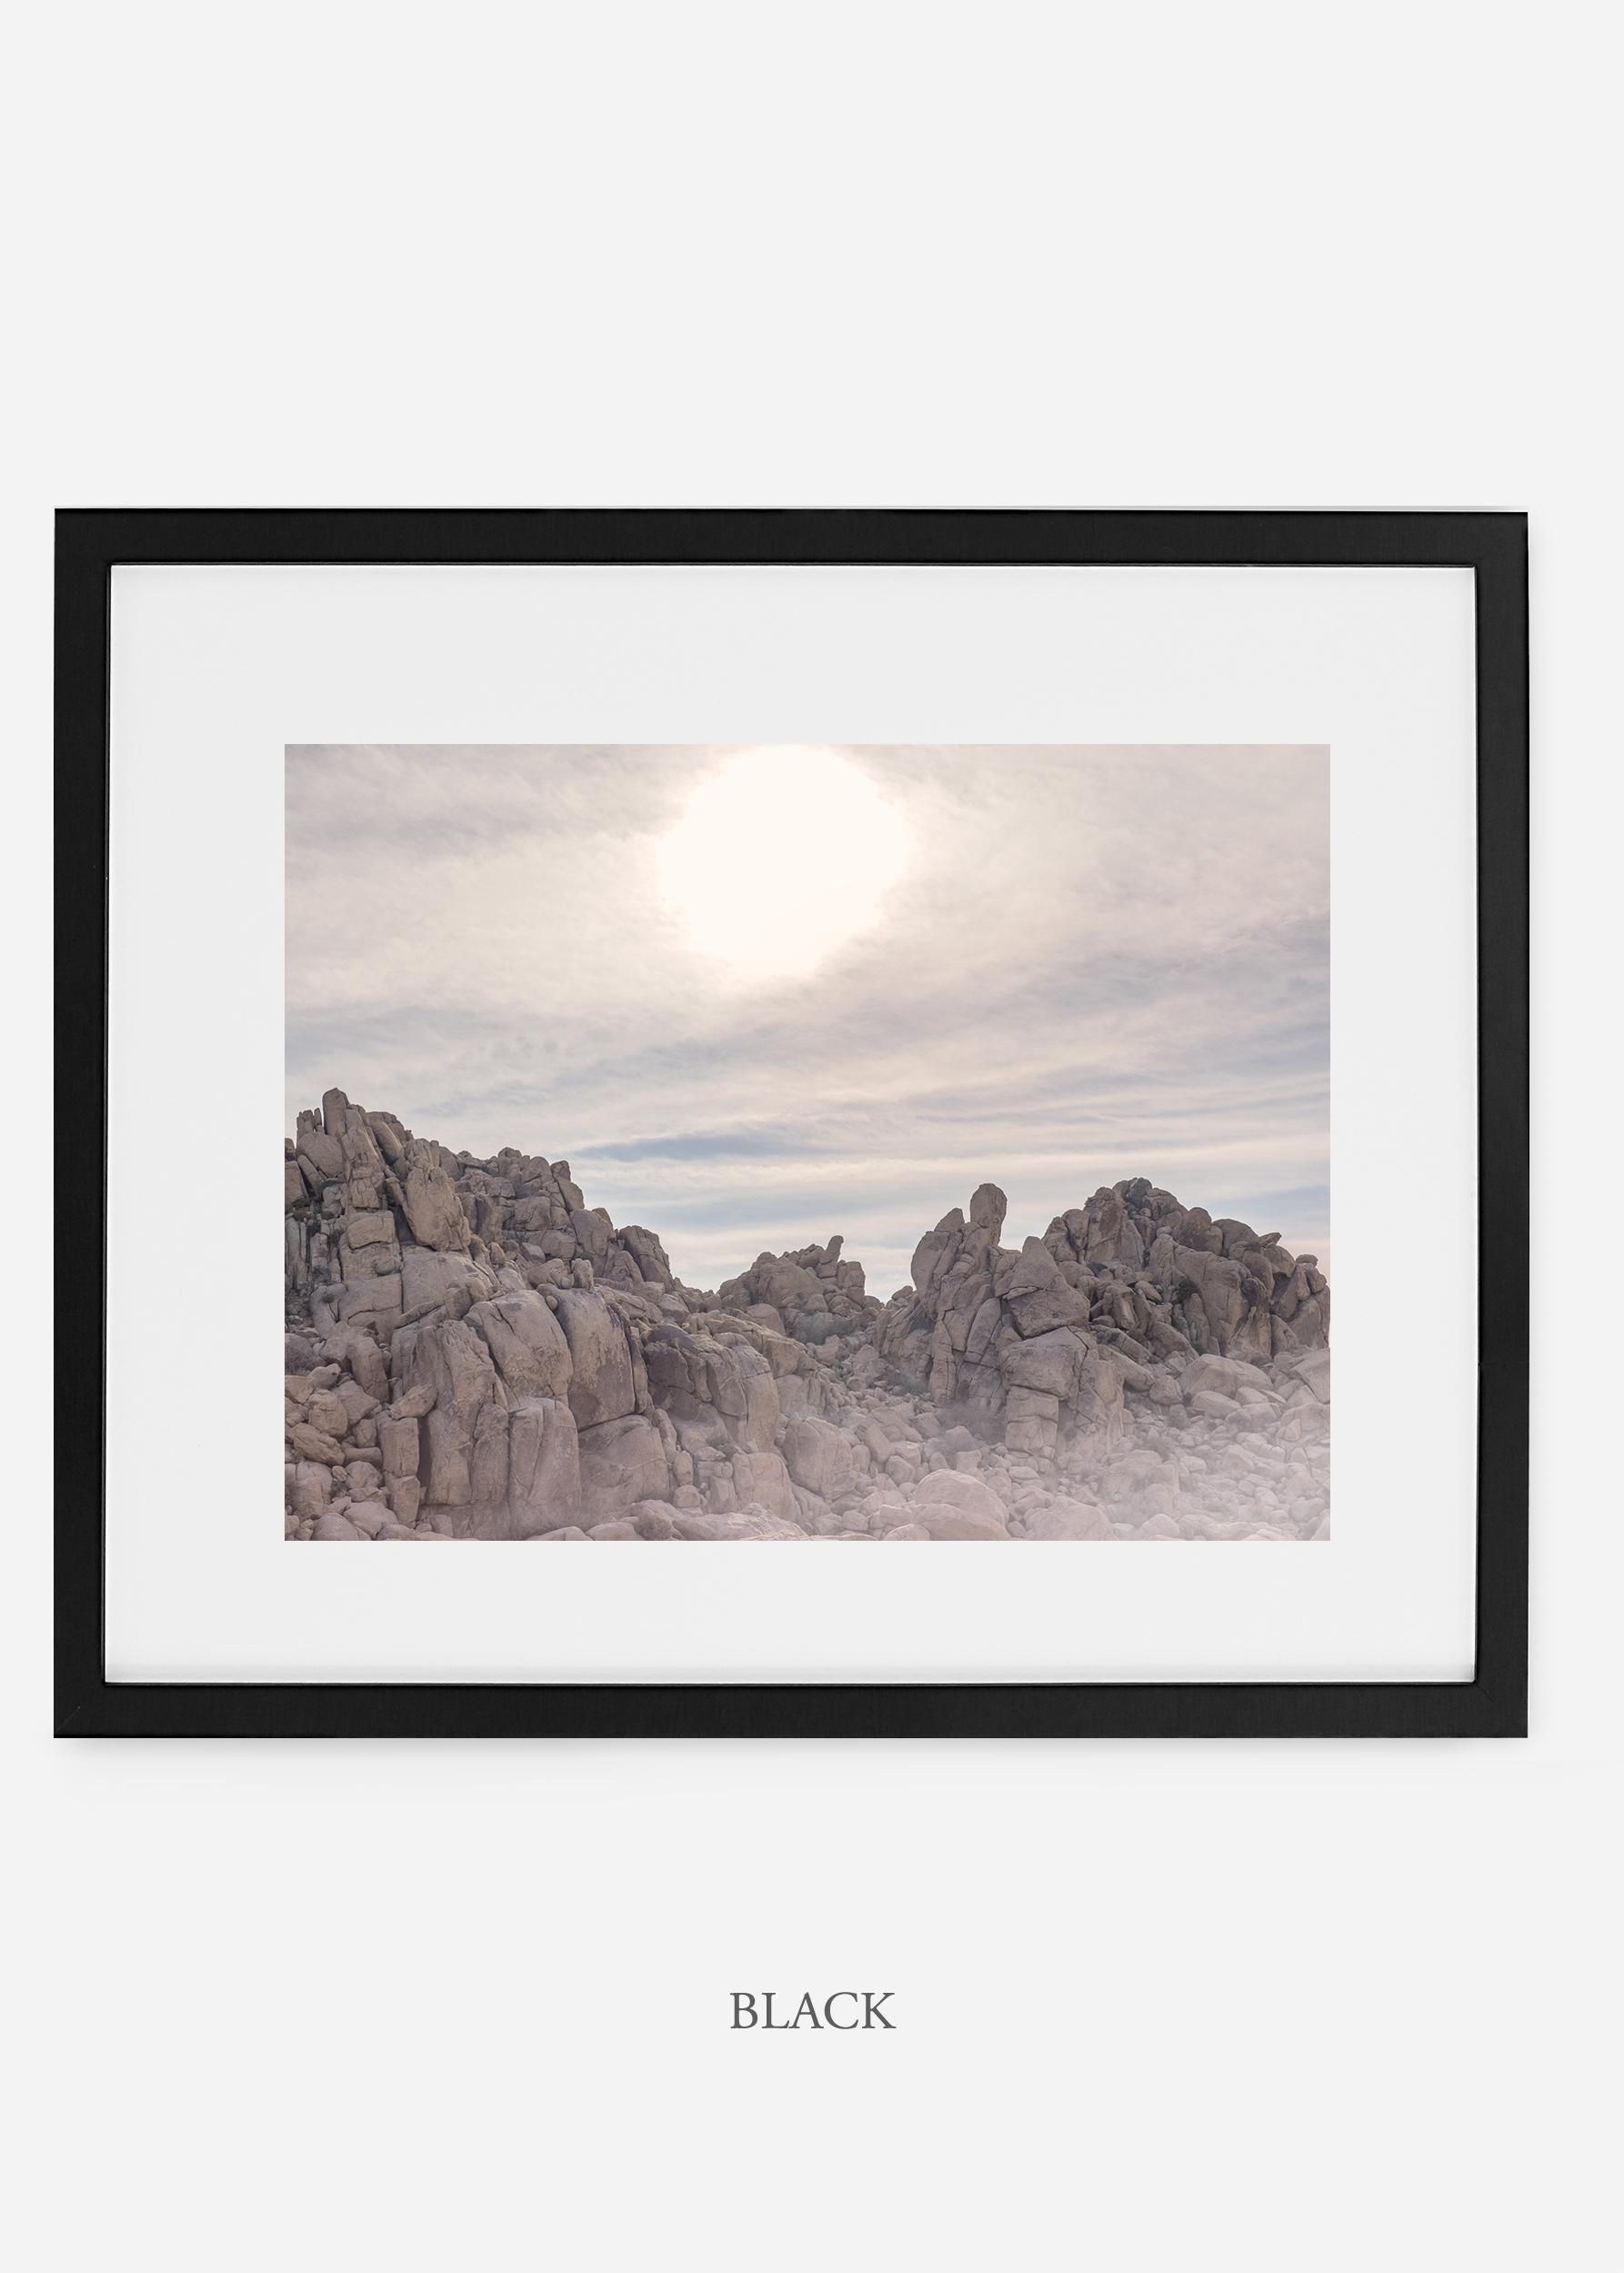 WilderCalifornia_blackframe_JoshuaTree_Rocks_No.3_interiordesign_desert_art.jpg